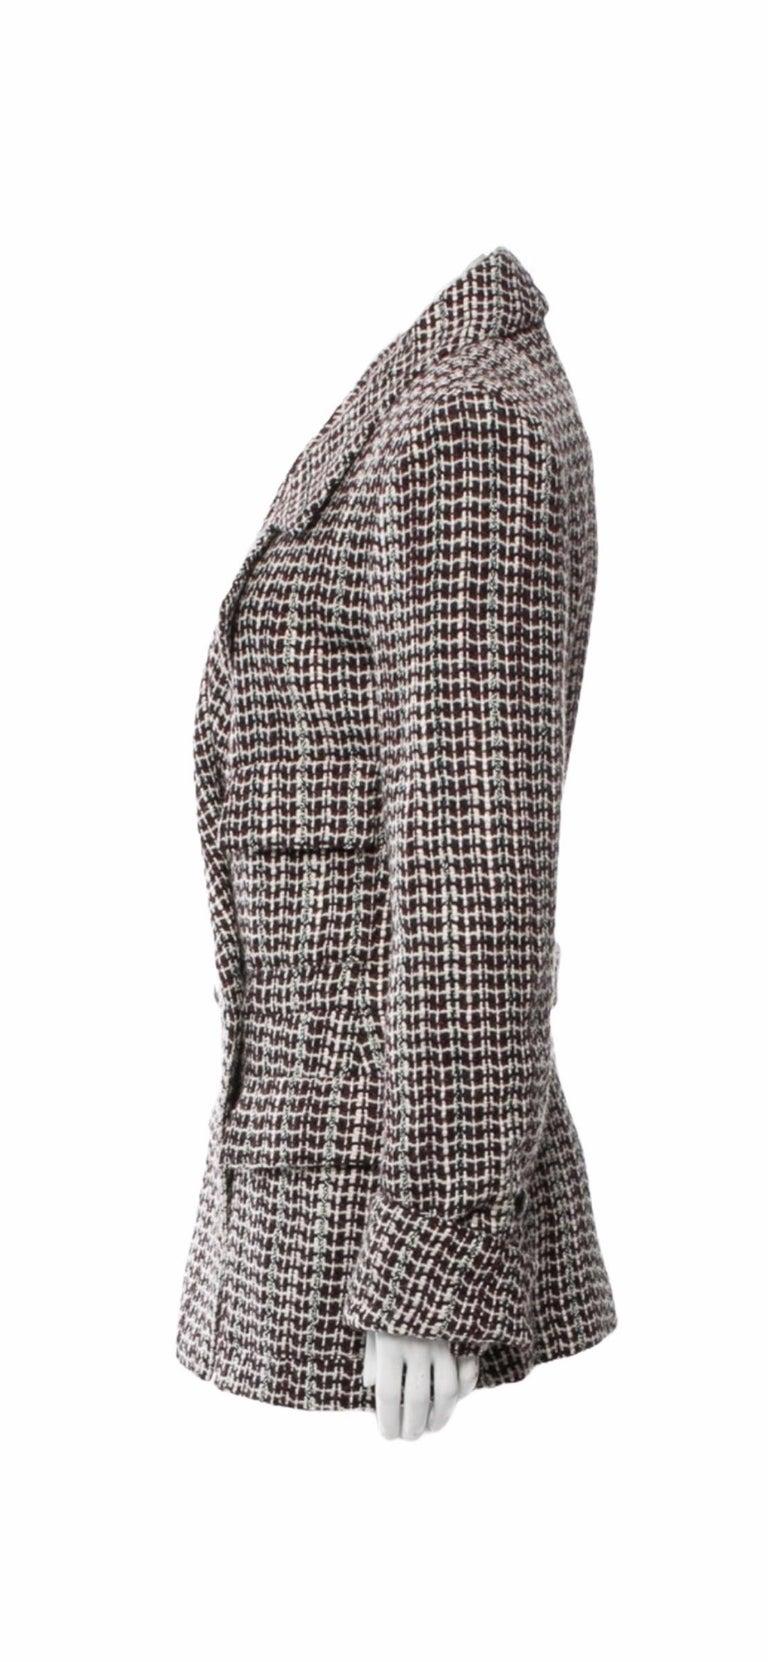 UNWORN Chanel Tweed & Sequins CC Logo Button Short Coat Jacket Blazer In Excellent Condition For Sale In Switzerland, CH